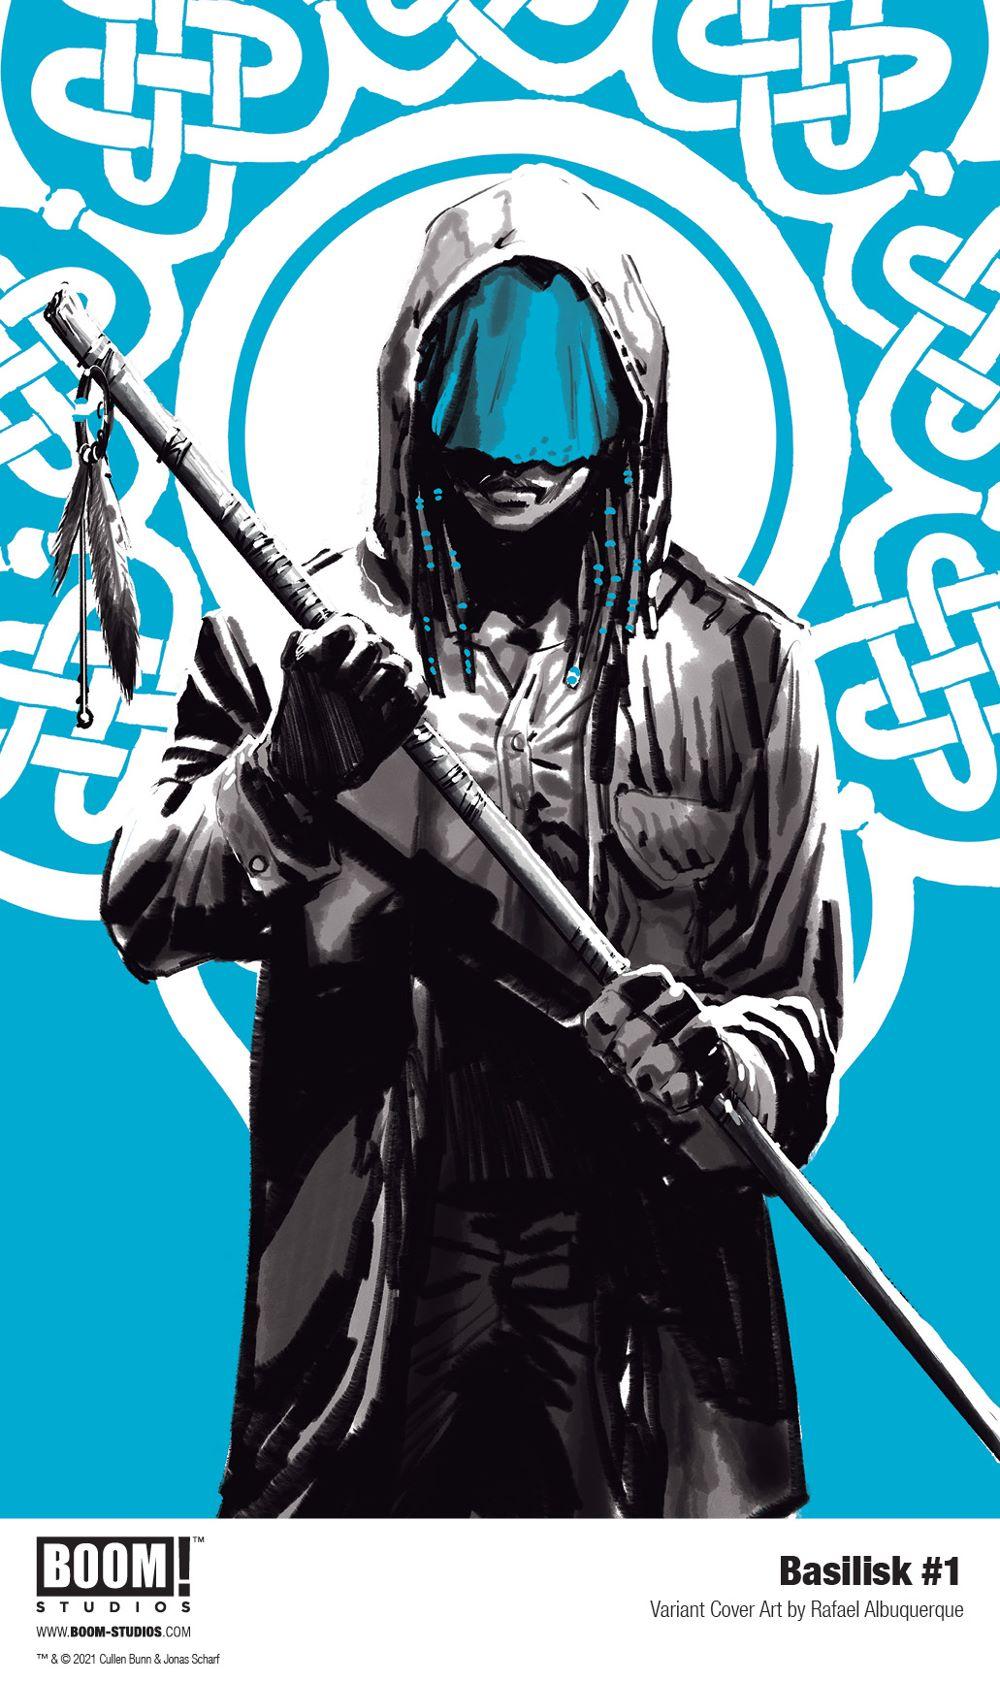 Basilisk_001_Cover_Variant_Albuquerque_PROMO Mortal enemies and mythology mix in BASILISK